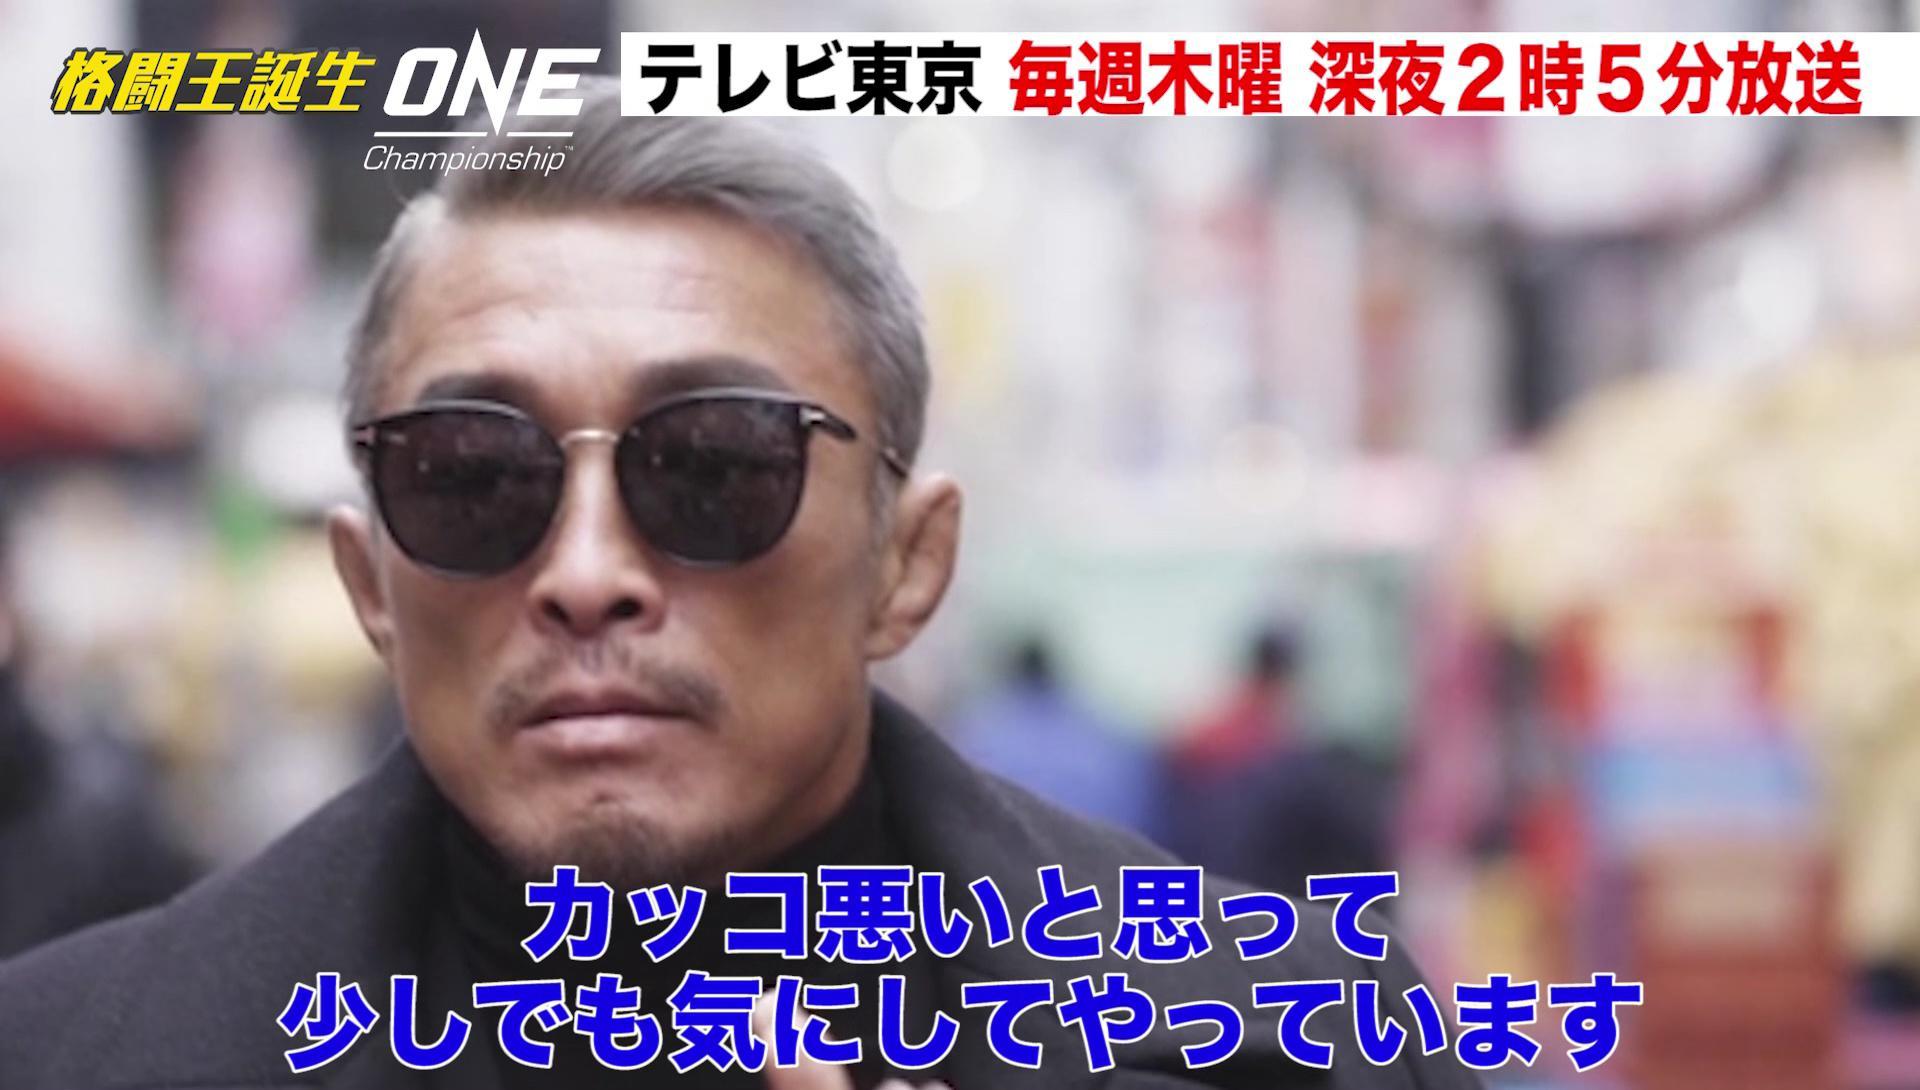 ONEシンガポール大会 44歳格闘家・秋山成勲に独占インタビュー/格闘王誕生!ONE Championship